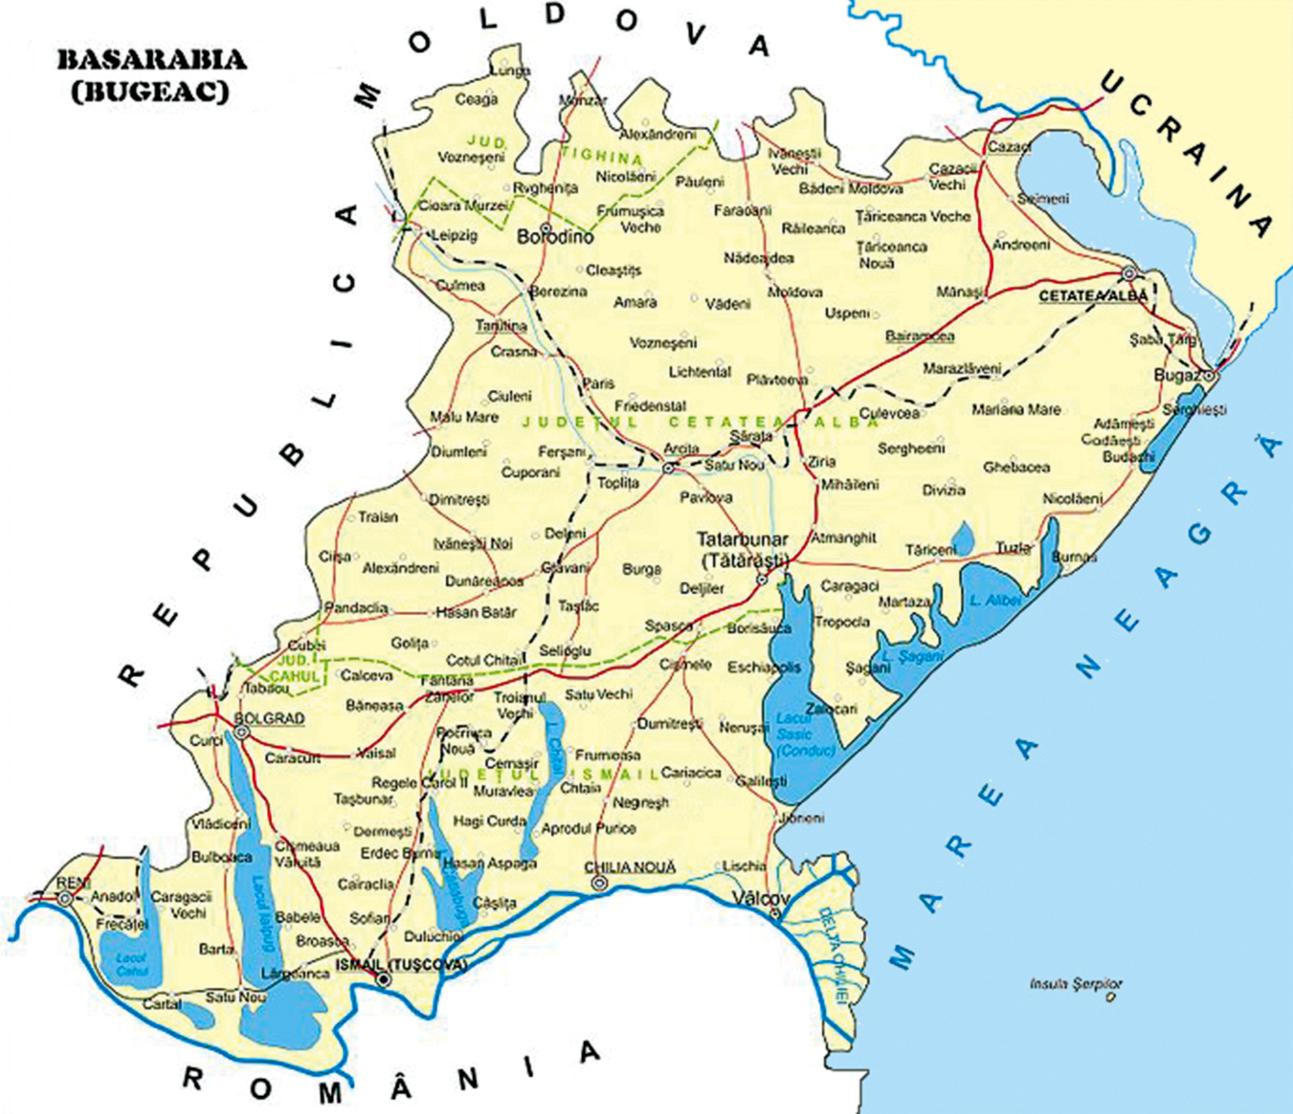 teritorii bugeac